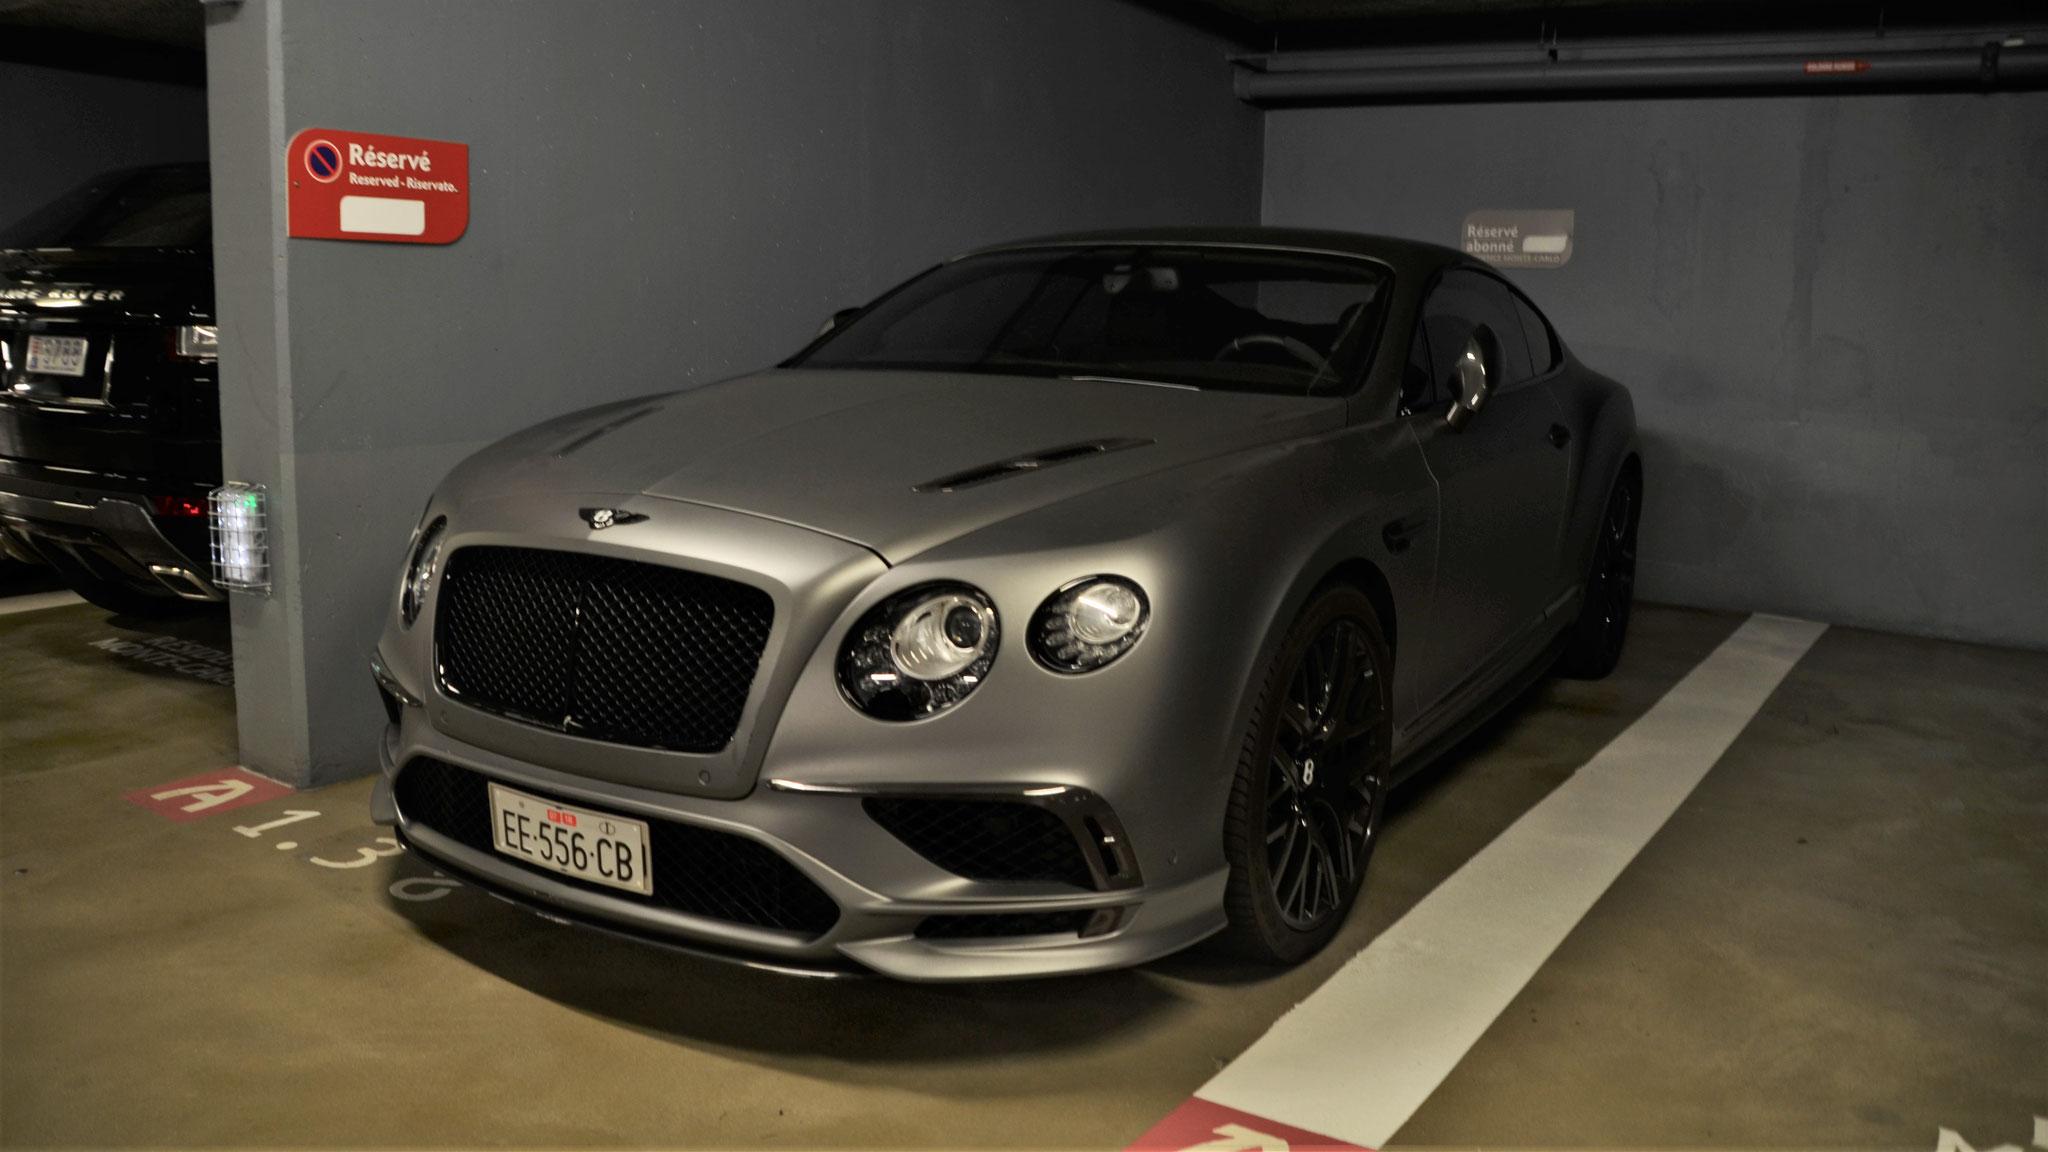 Bentley Continental GTC Supersports - EE-556-CB (ITA)